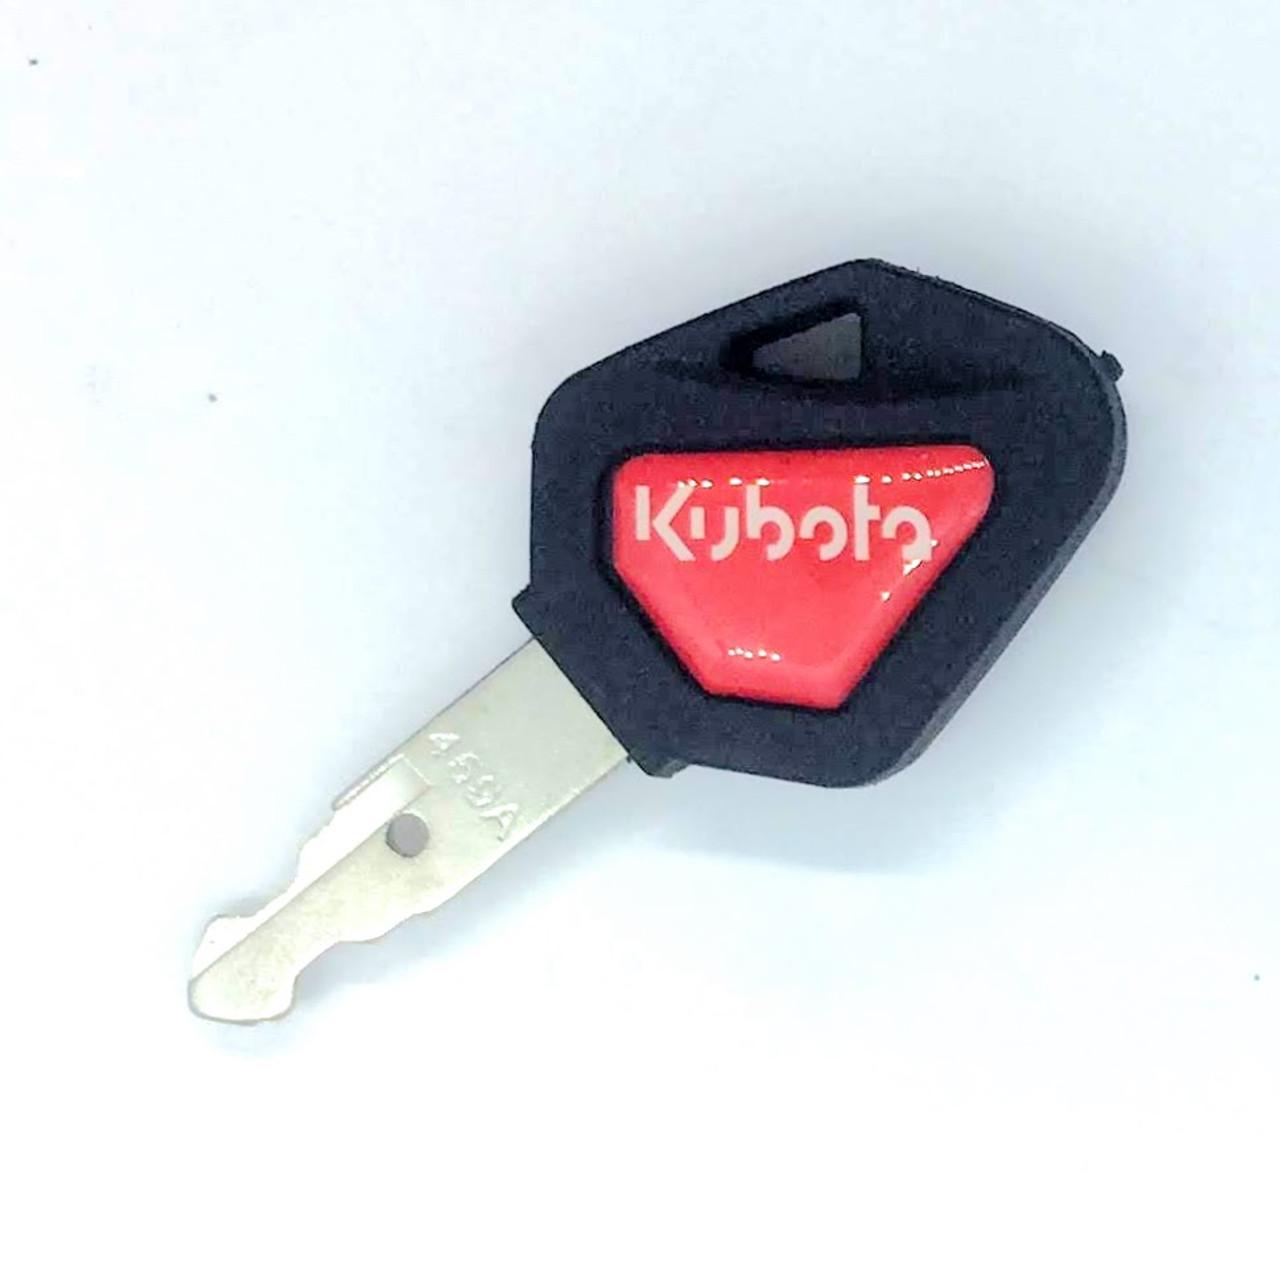 459A Kubota Excavator /& Wheel Loader Key *5 Pack*